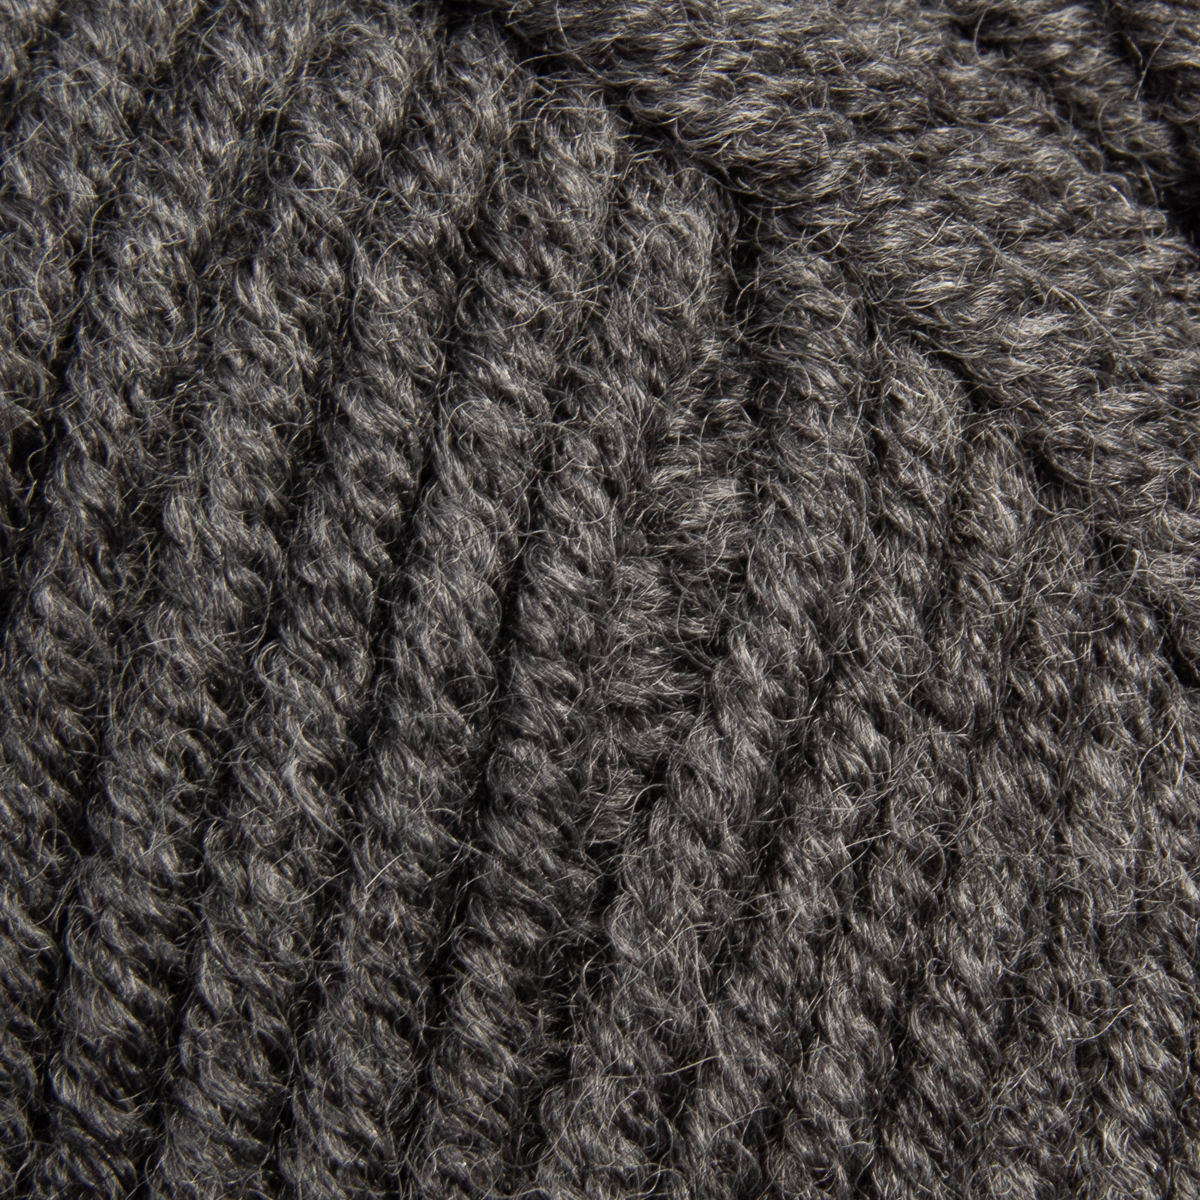 3pk-Lion-Brand-Woolspun-Acrylic-amp-Wool-Yarn-Bulky-5-Knit-Crocheting-Skeins-Soft thumbnail 27